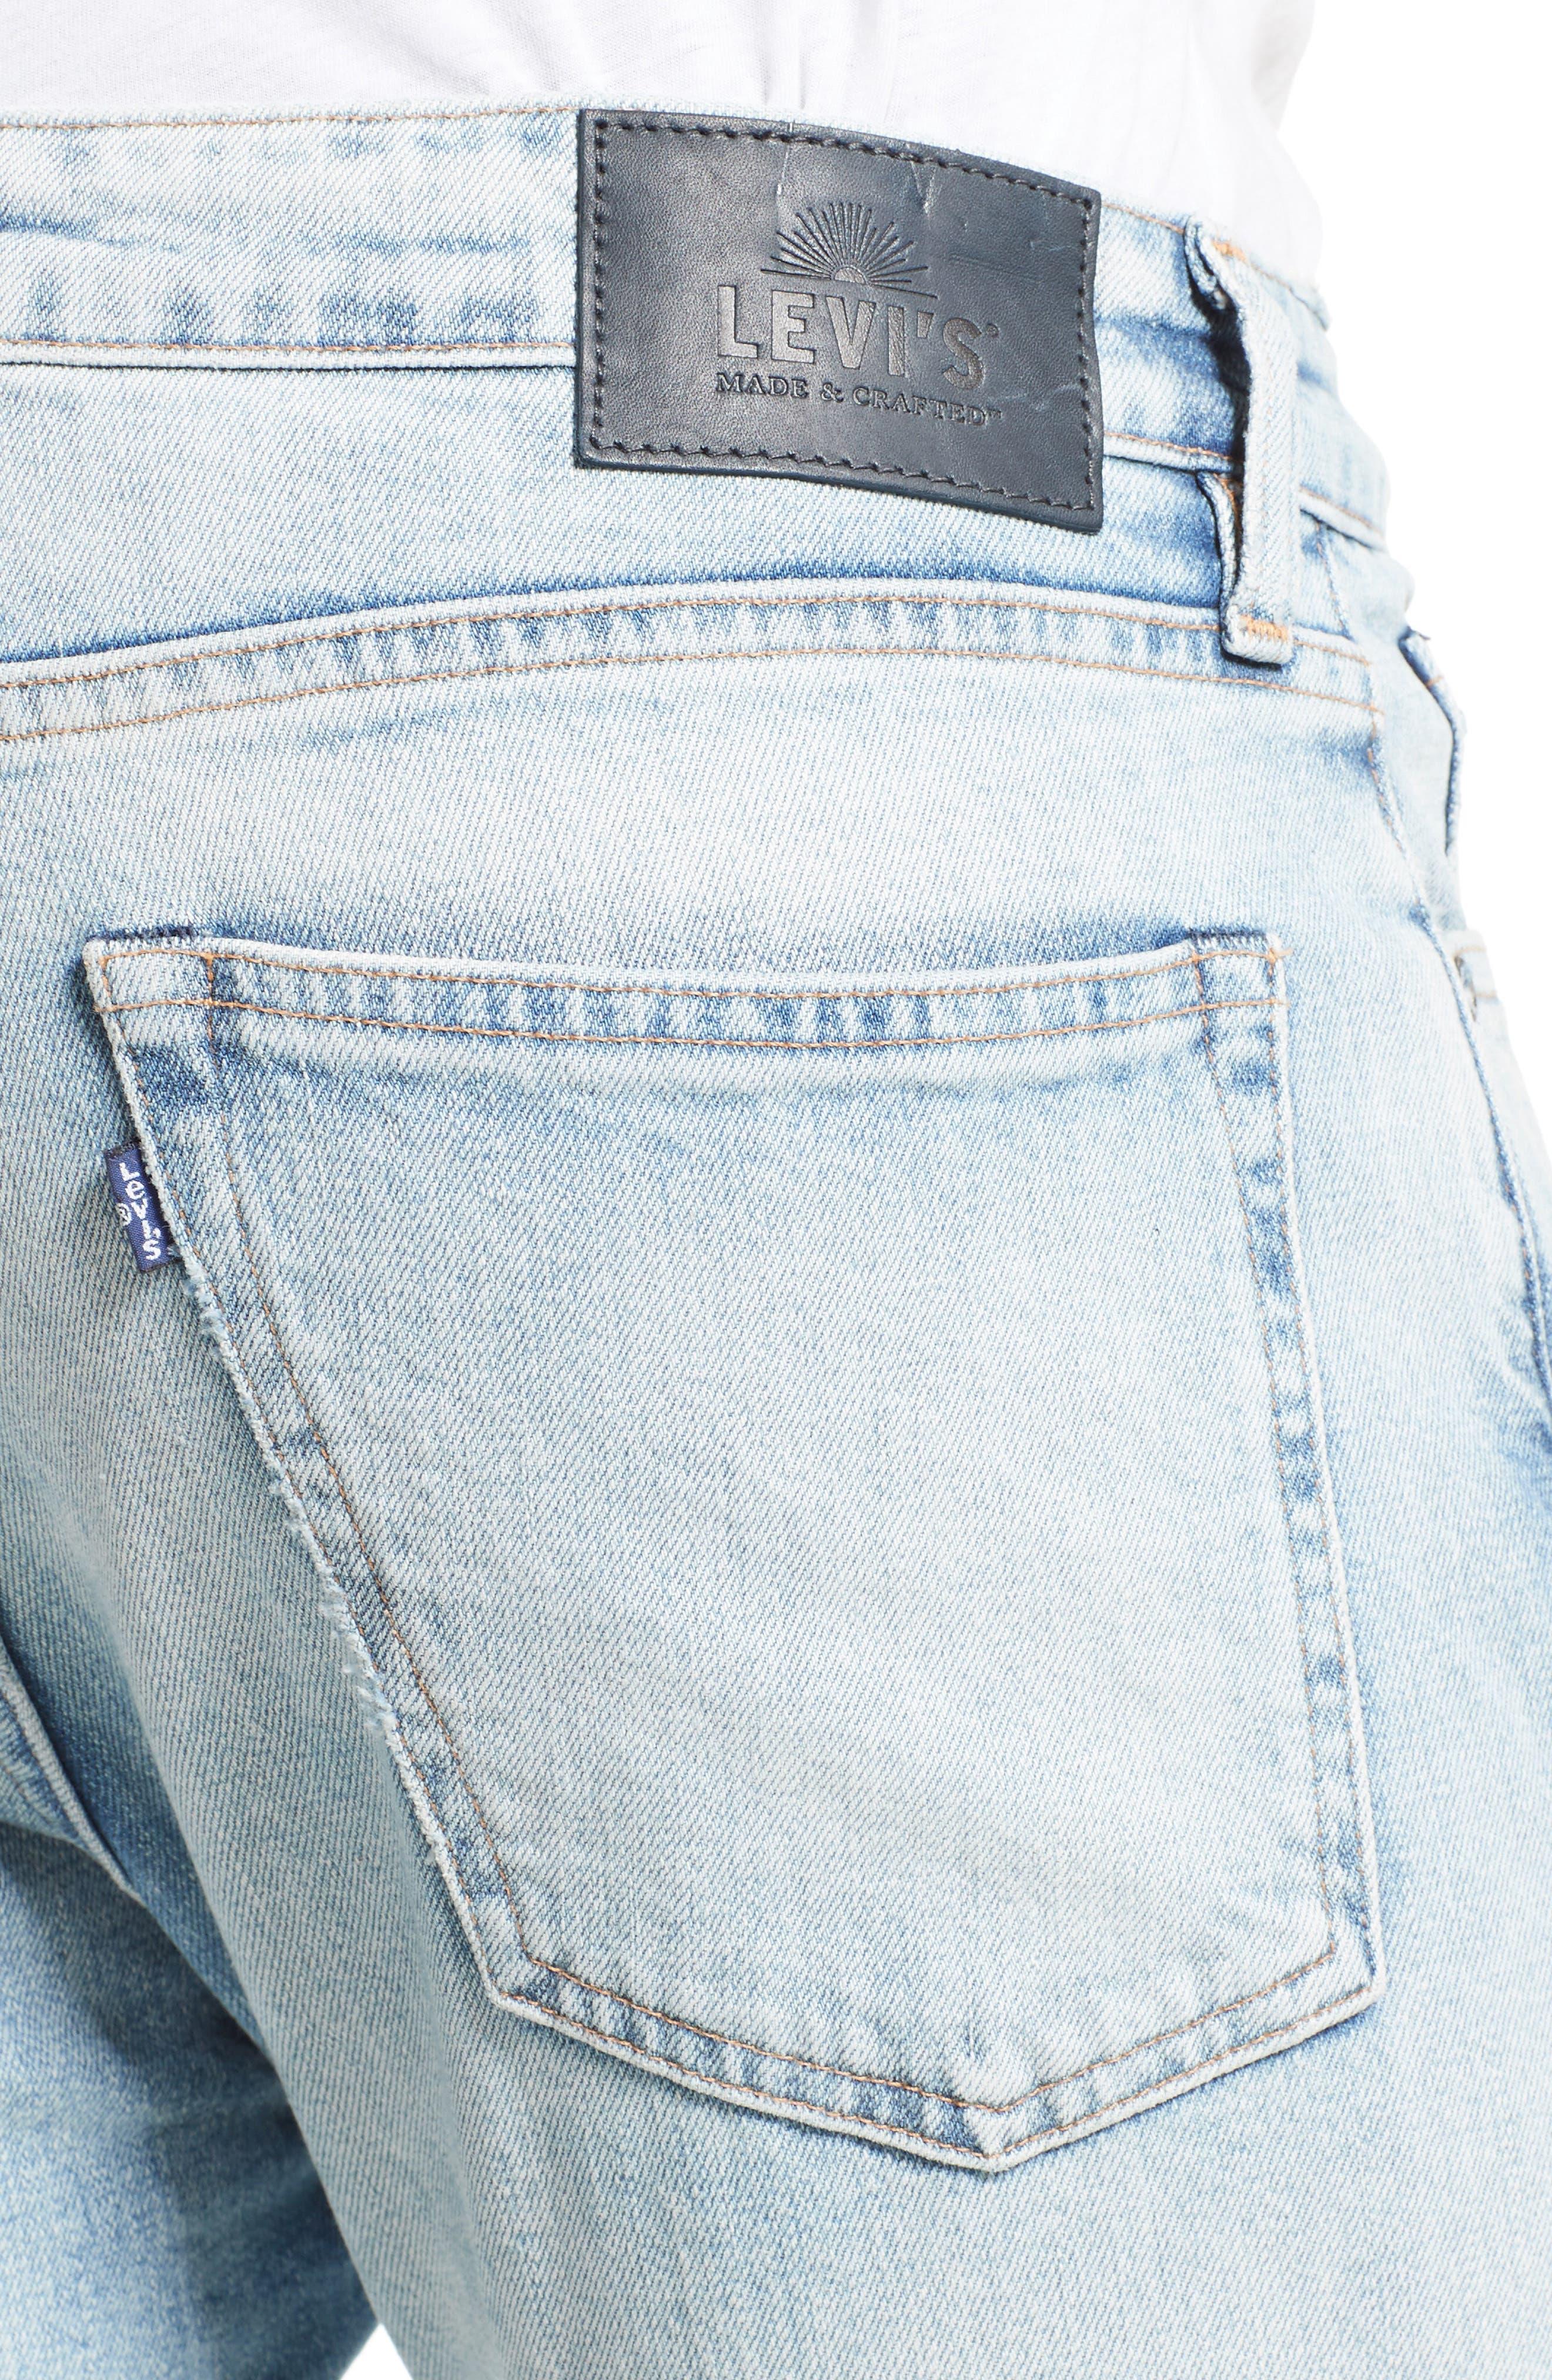 Tack Slim Fit Jeans,                             Alternate thumbnail 4, color,                             450